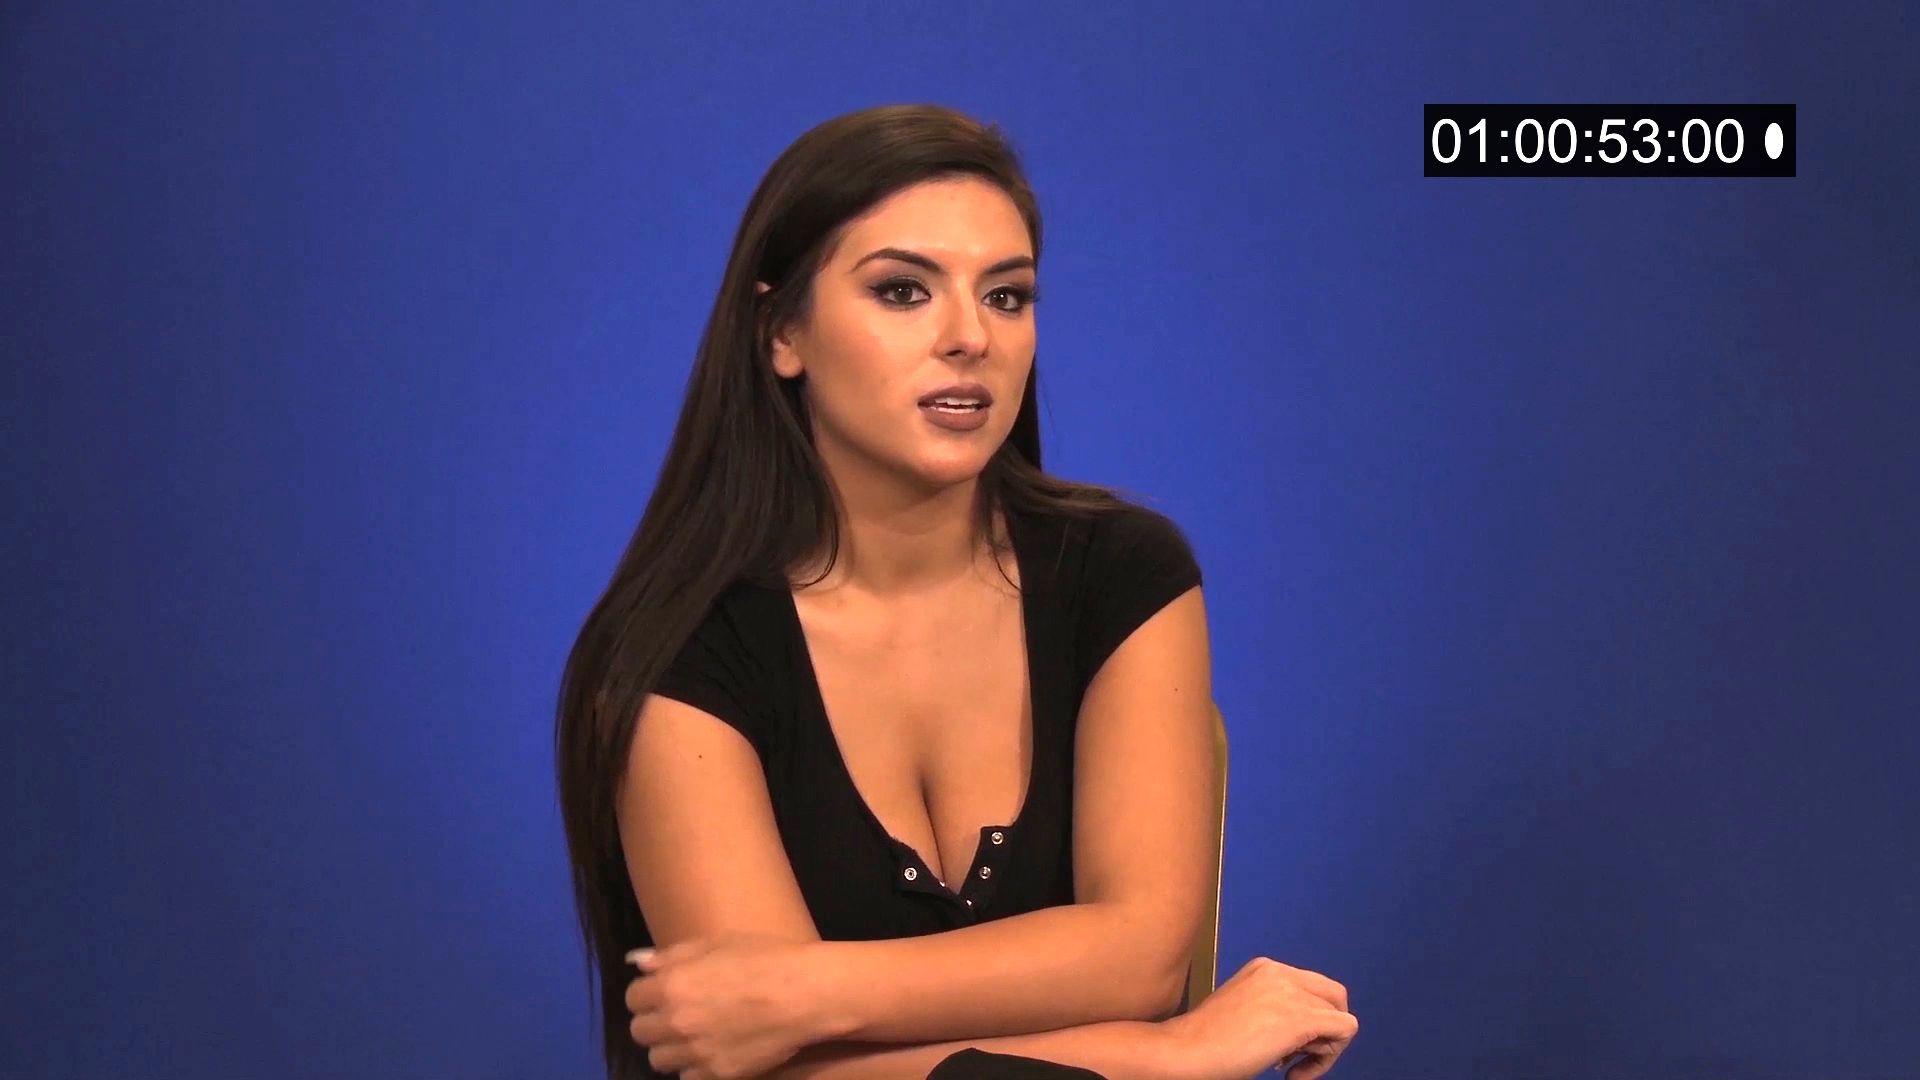 Bonus Casting Tapes Revealed Victoria Wyatt Are You